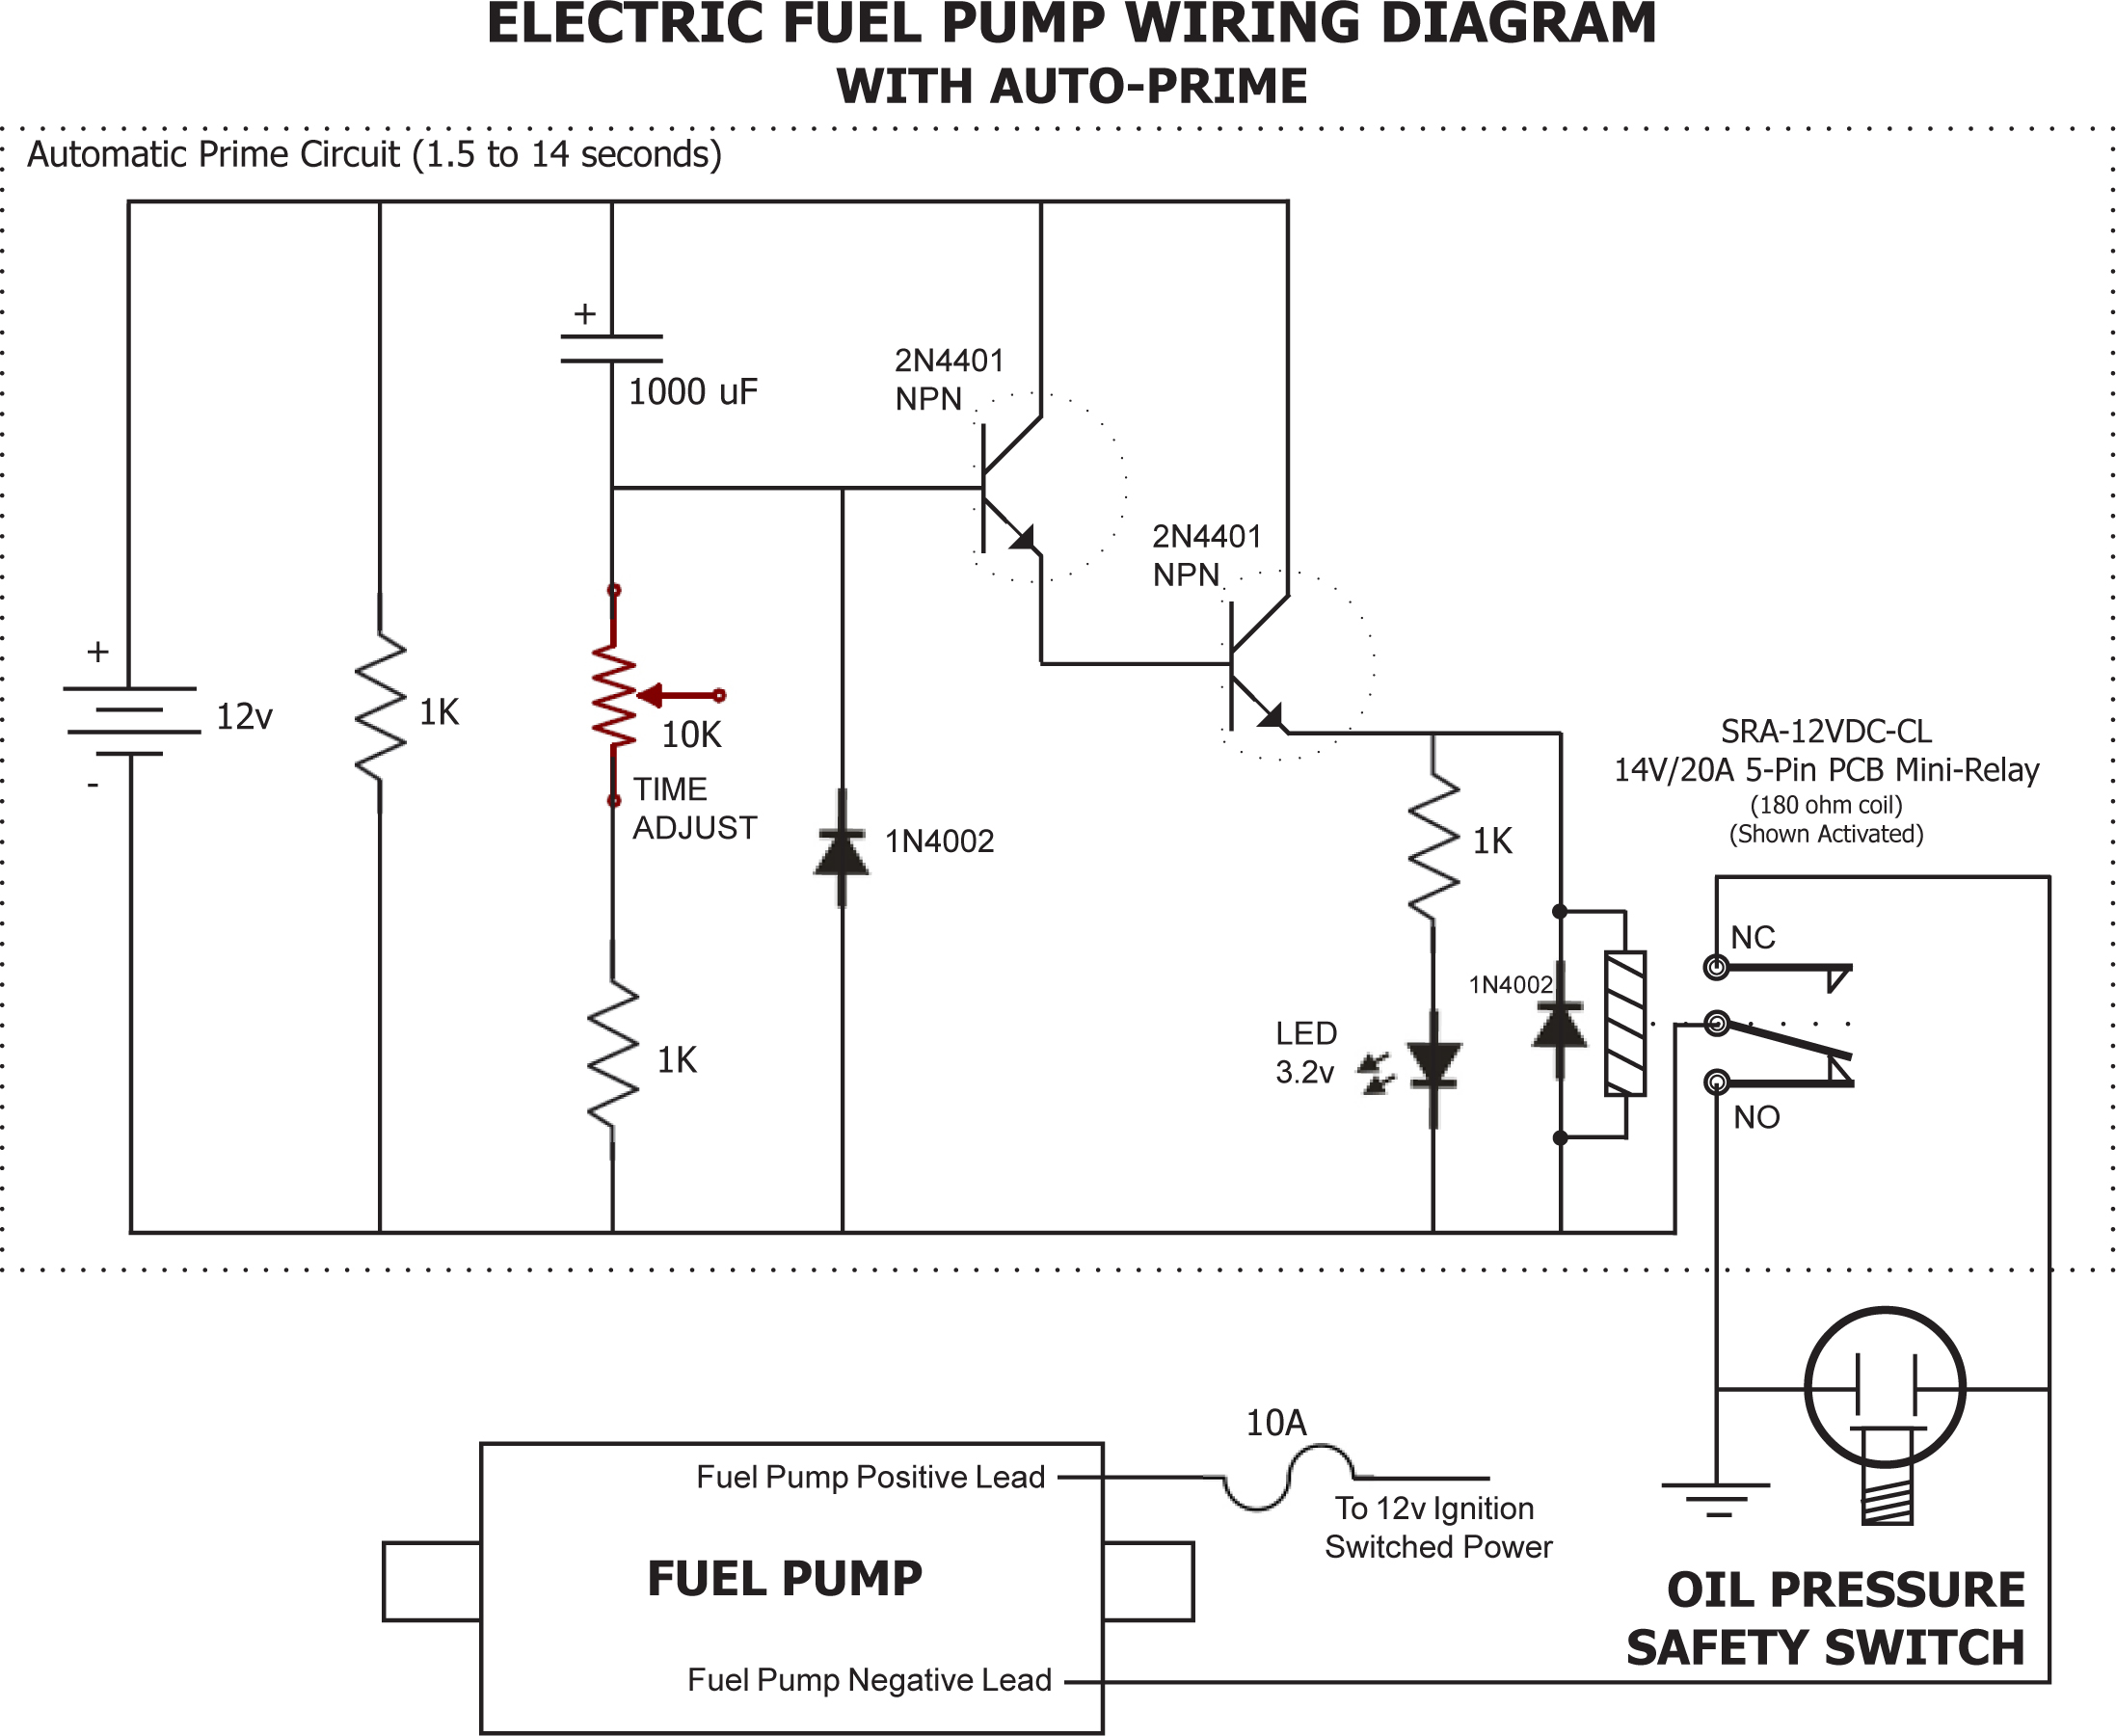 Boat Wiring Diagrams On Marine Electric Fuel Pump Wiring Diagram